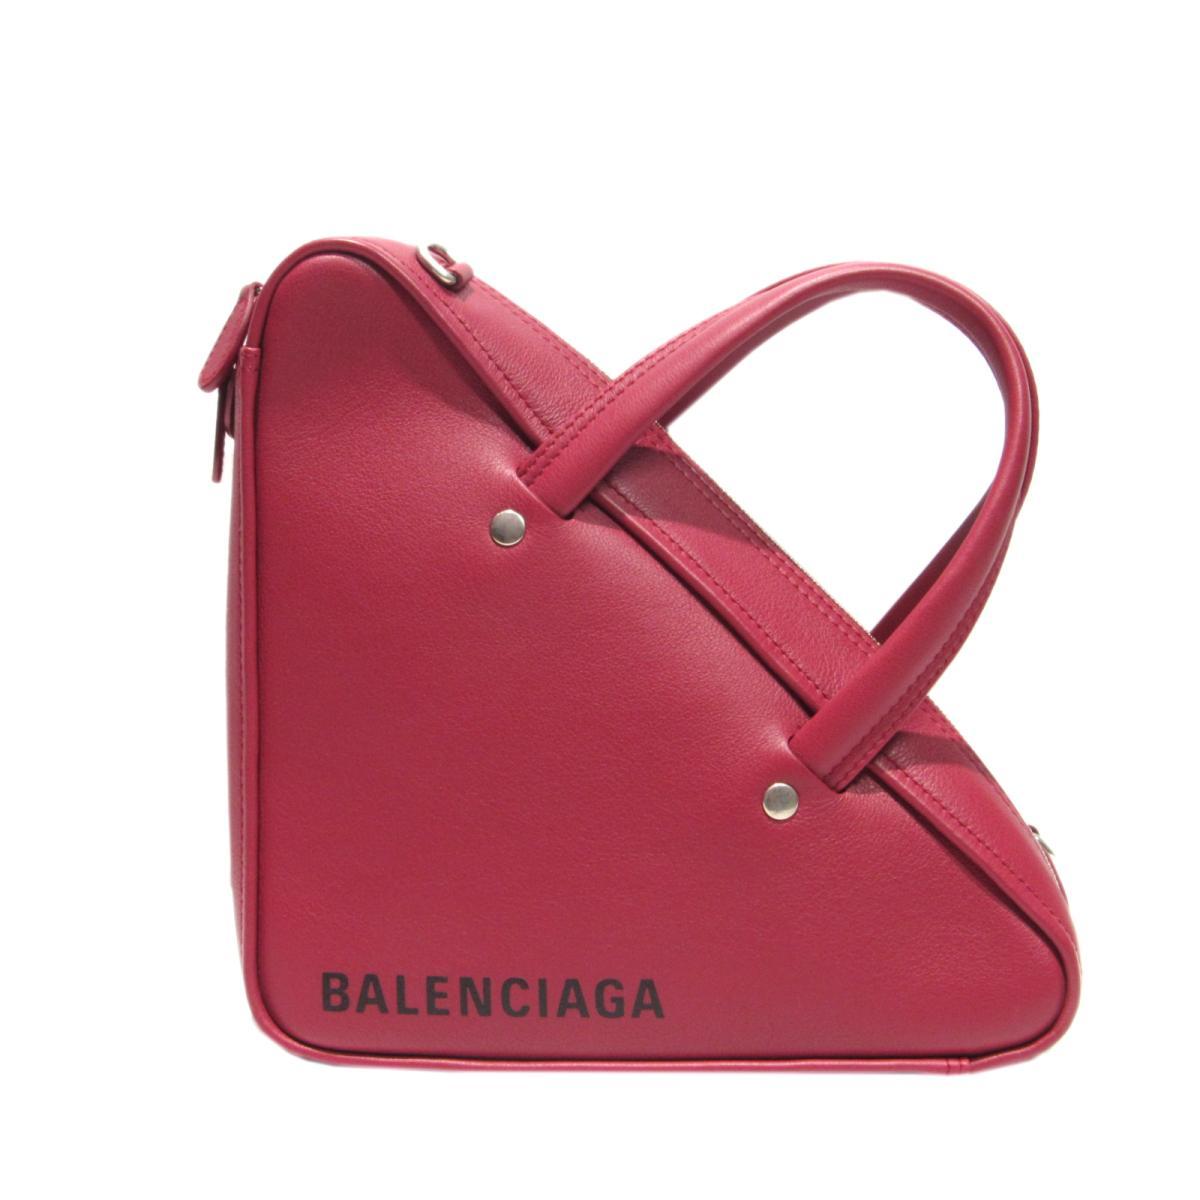 BALENCIAGA バッグ  トライアングルダッフルXS 2wayショルダーバッグ